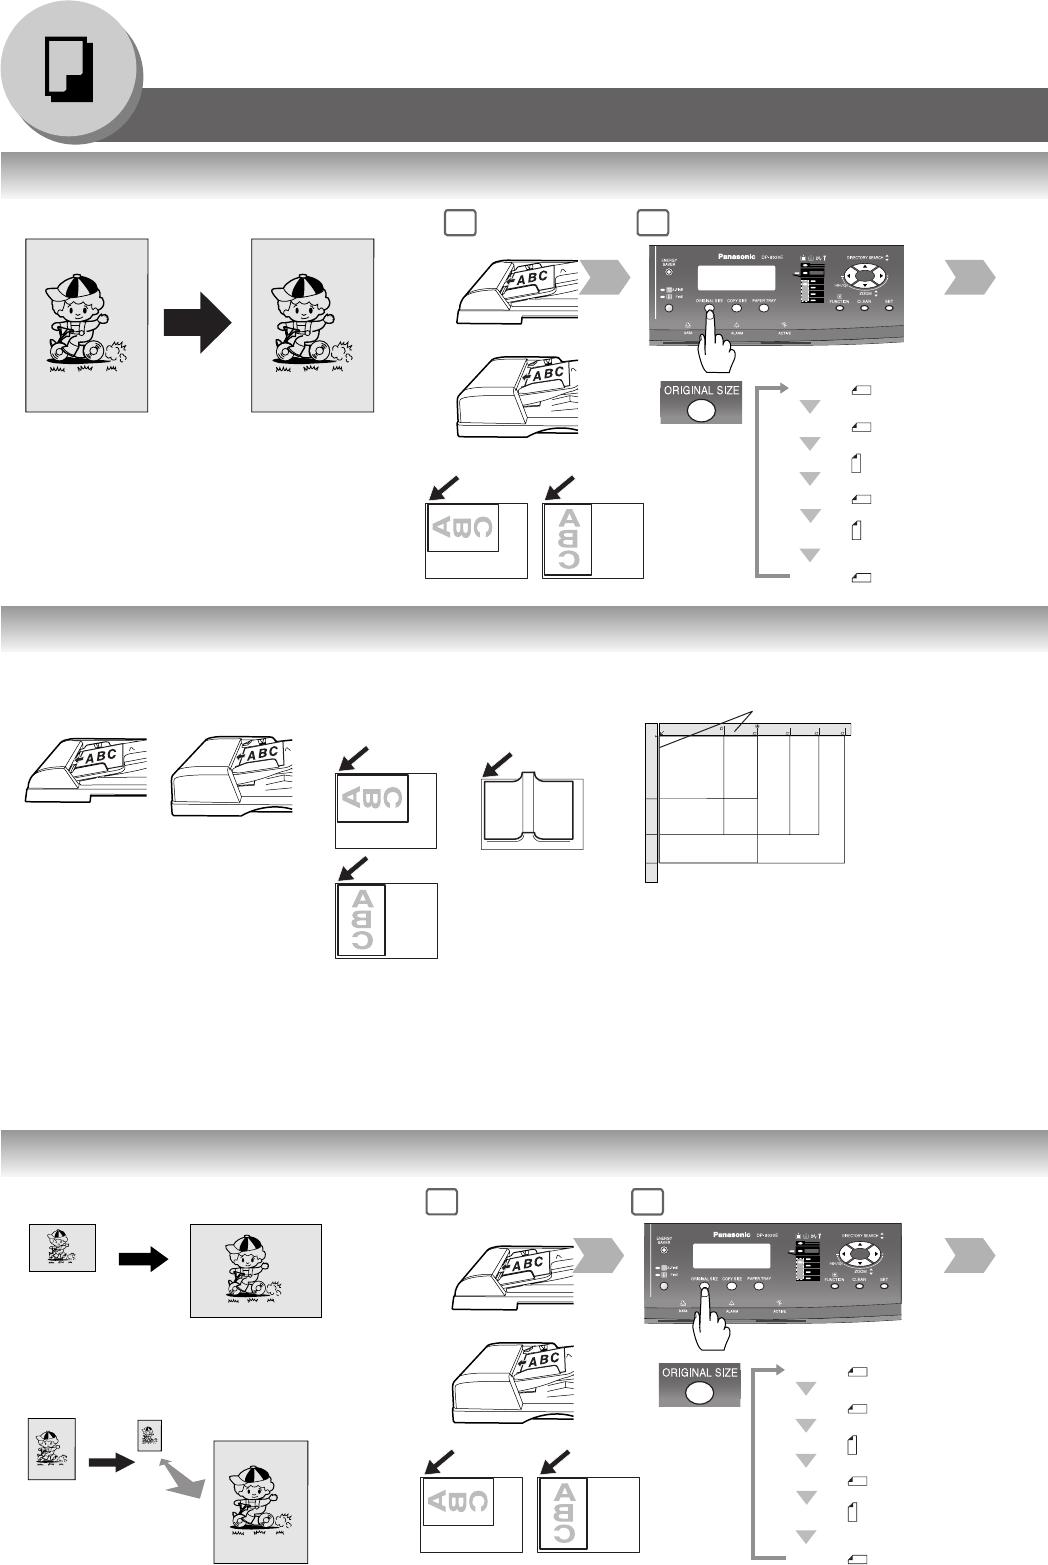 Panasonic 8016P DP 8020P/8020E/8016P (For Copy & Network Scan ...